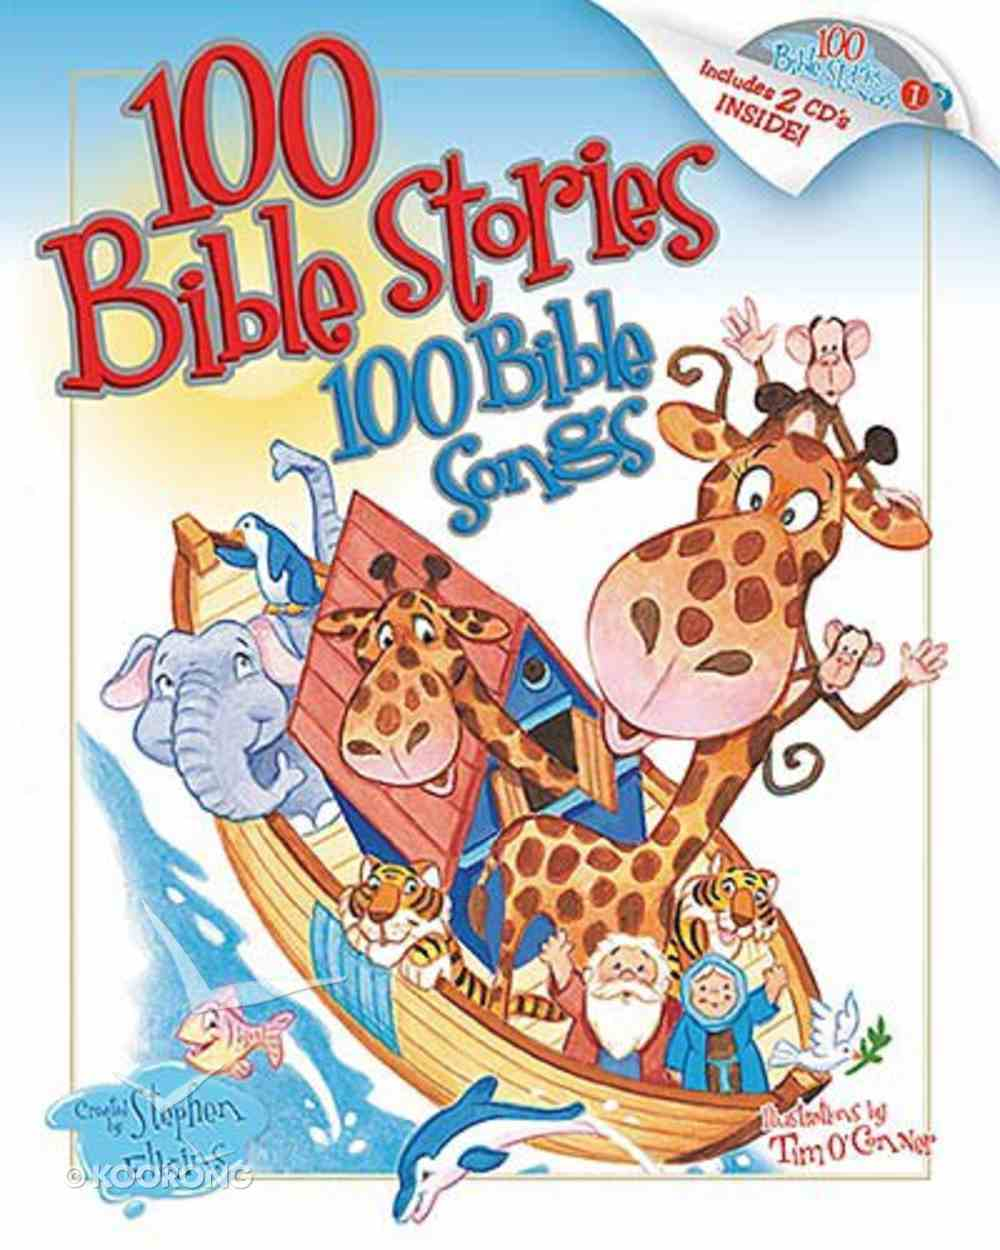 100 Bible Stories, 100 Bible Songs Hardback